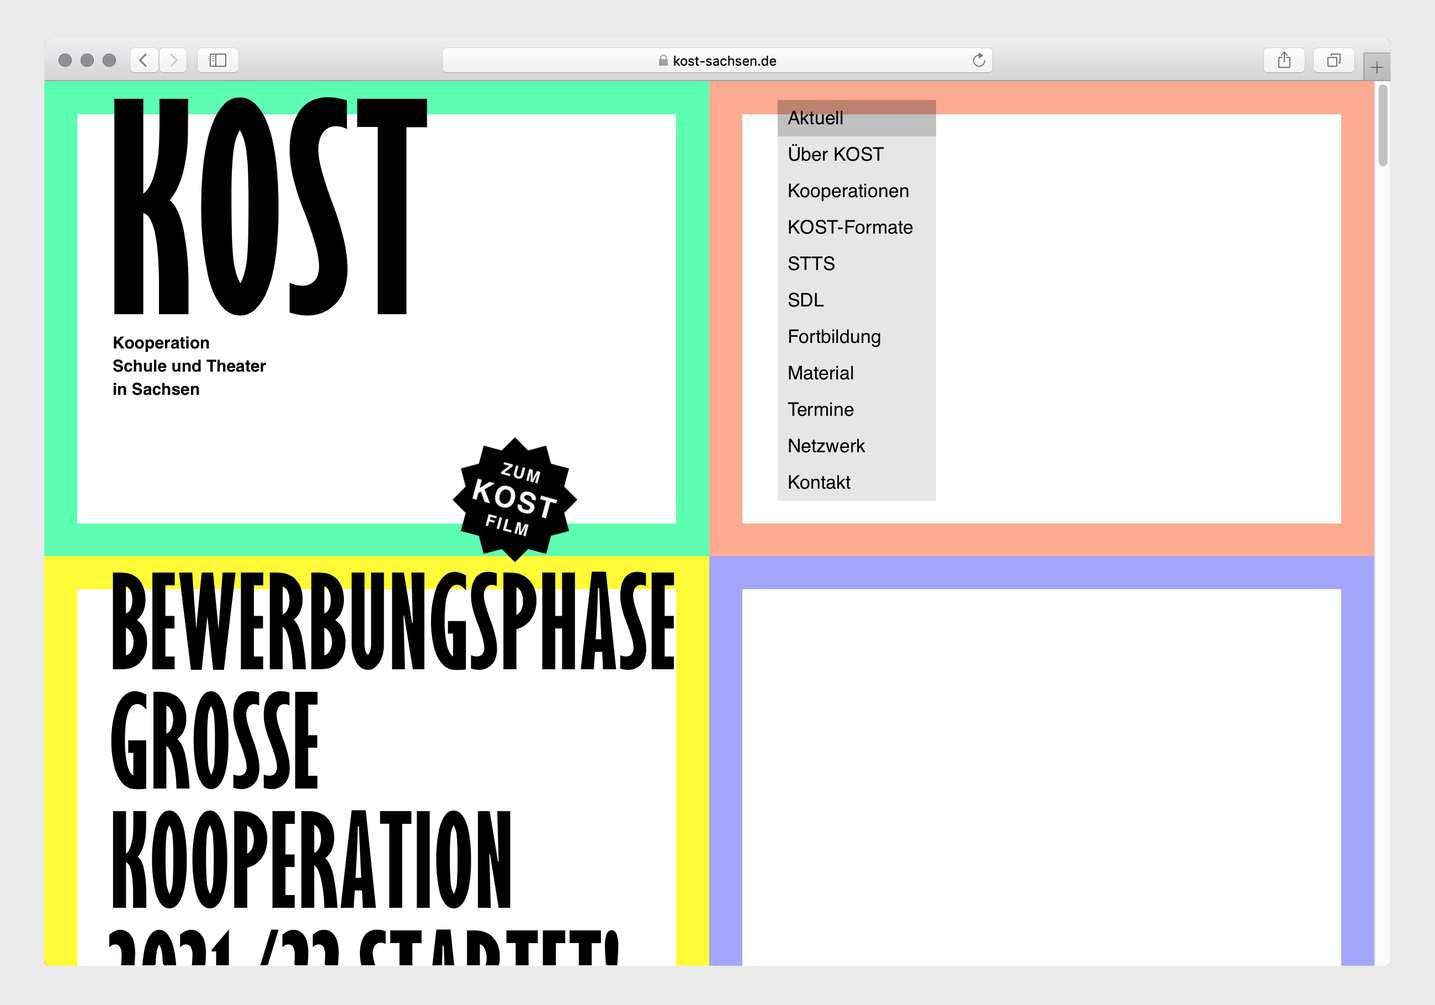 kost-website-1-1435x1004px